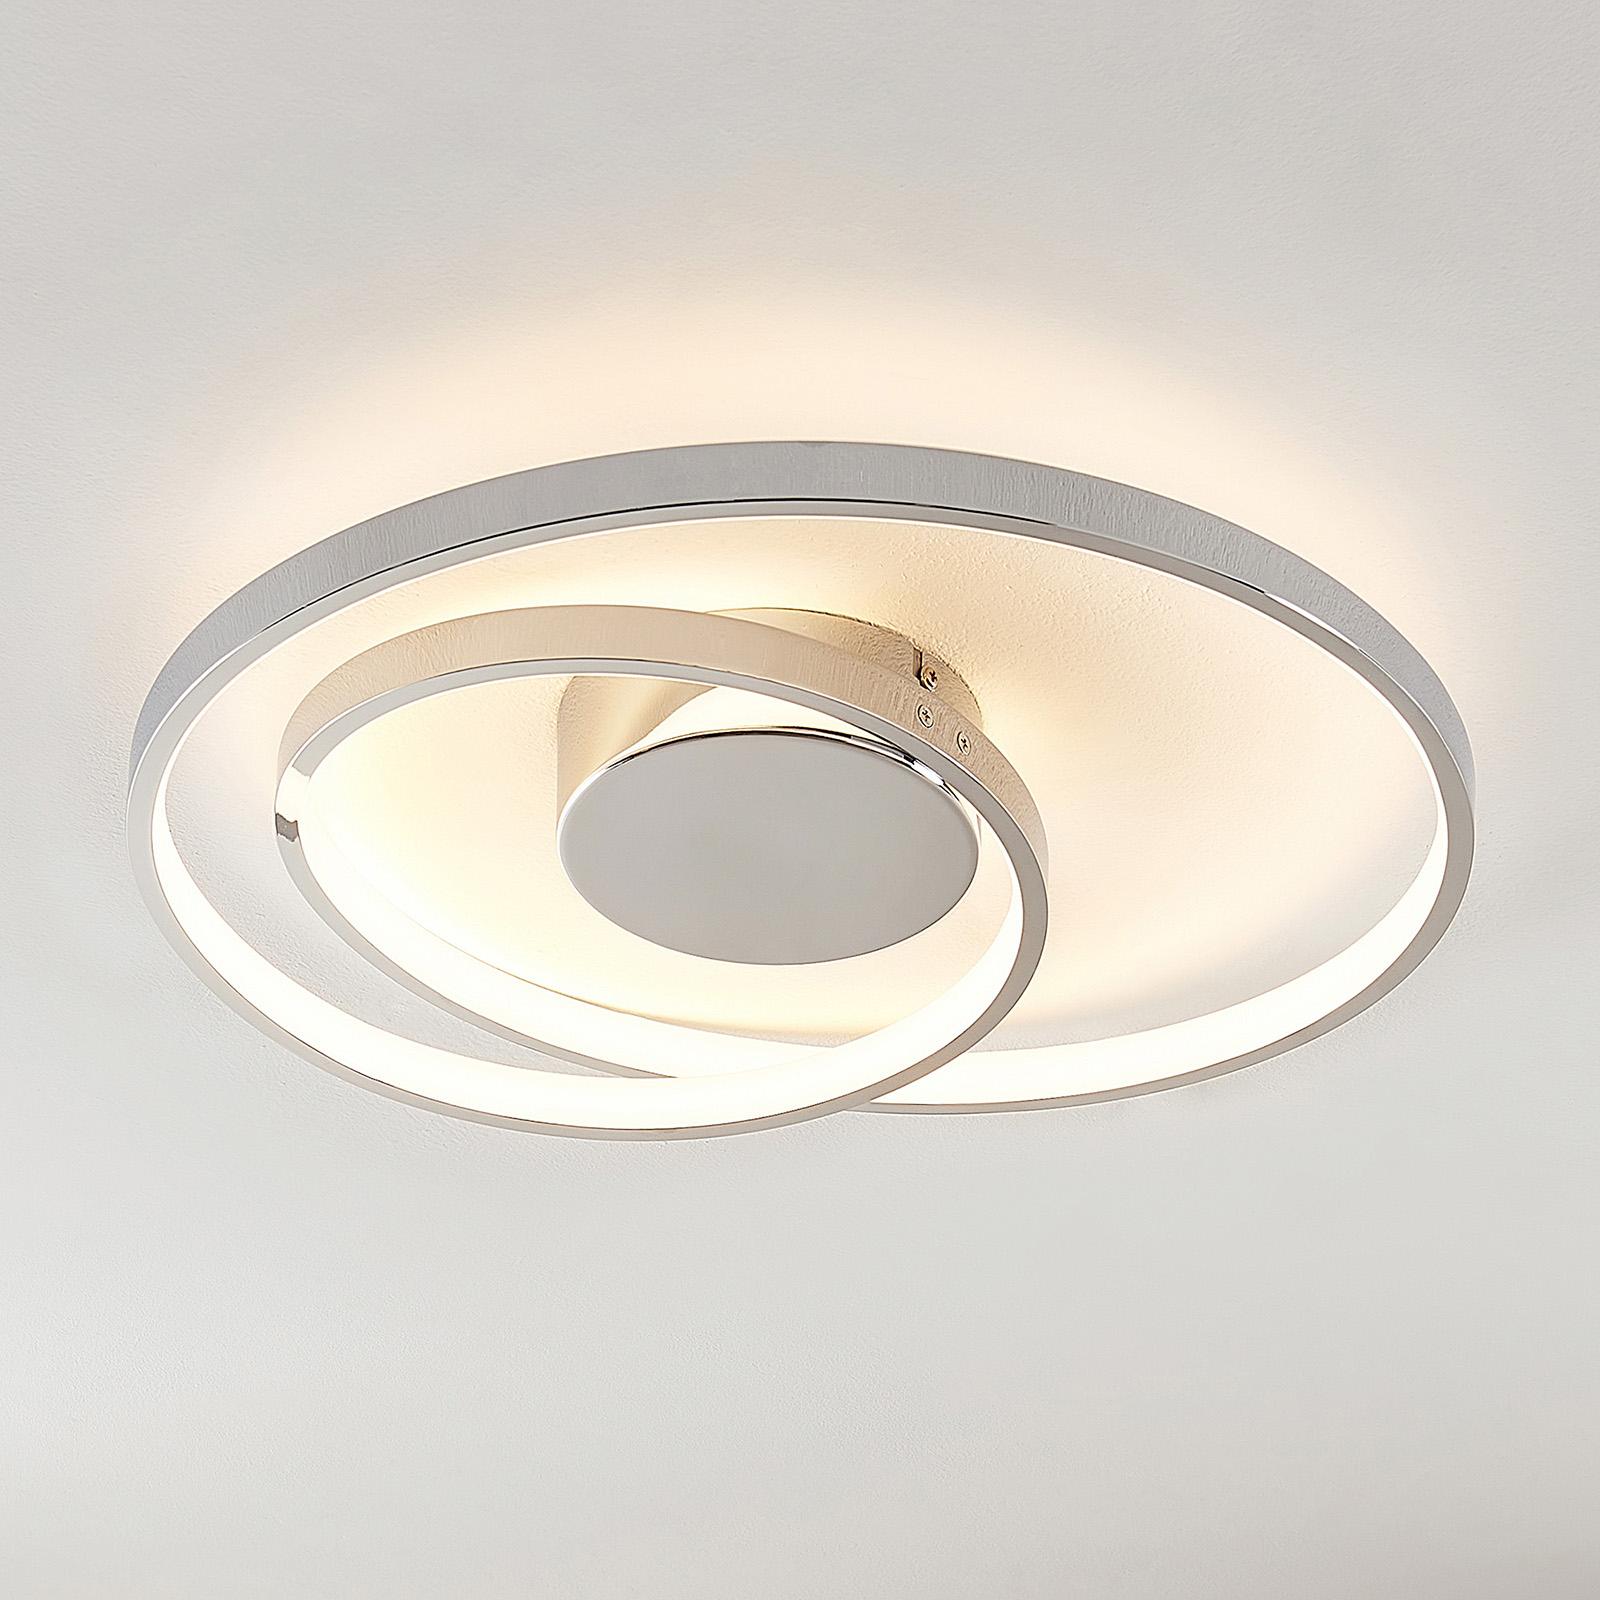 Lucande Maire LED-Deckenleuchte